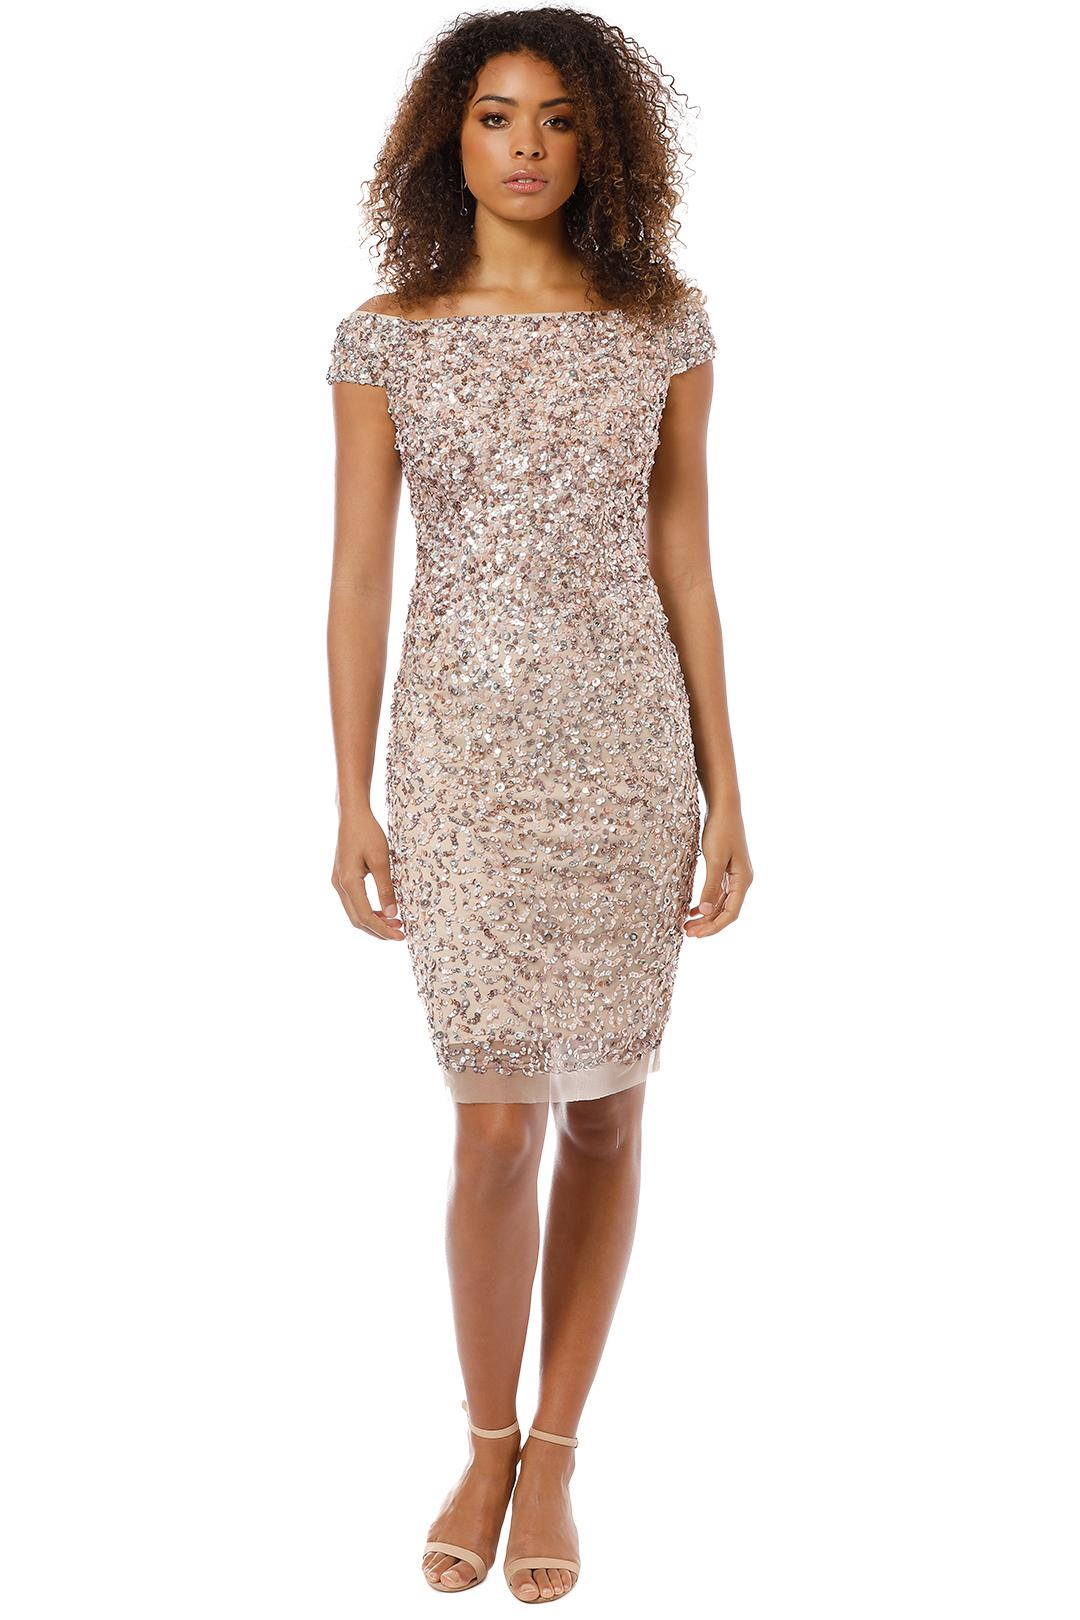 Beaded Dress,Blush Beaded Dress,Beaded Dresses Cheap,beaded dress,beaded dress,